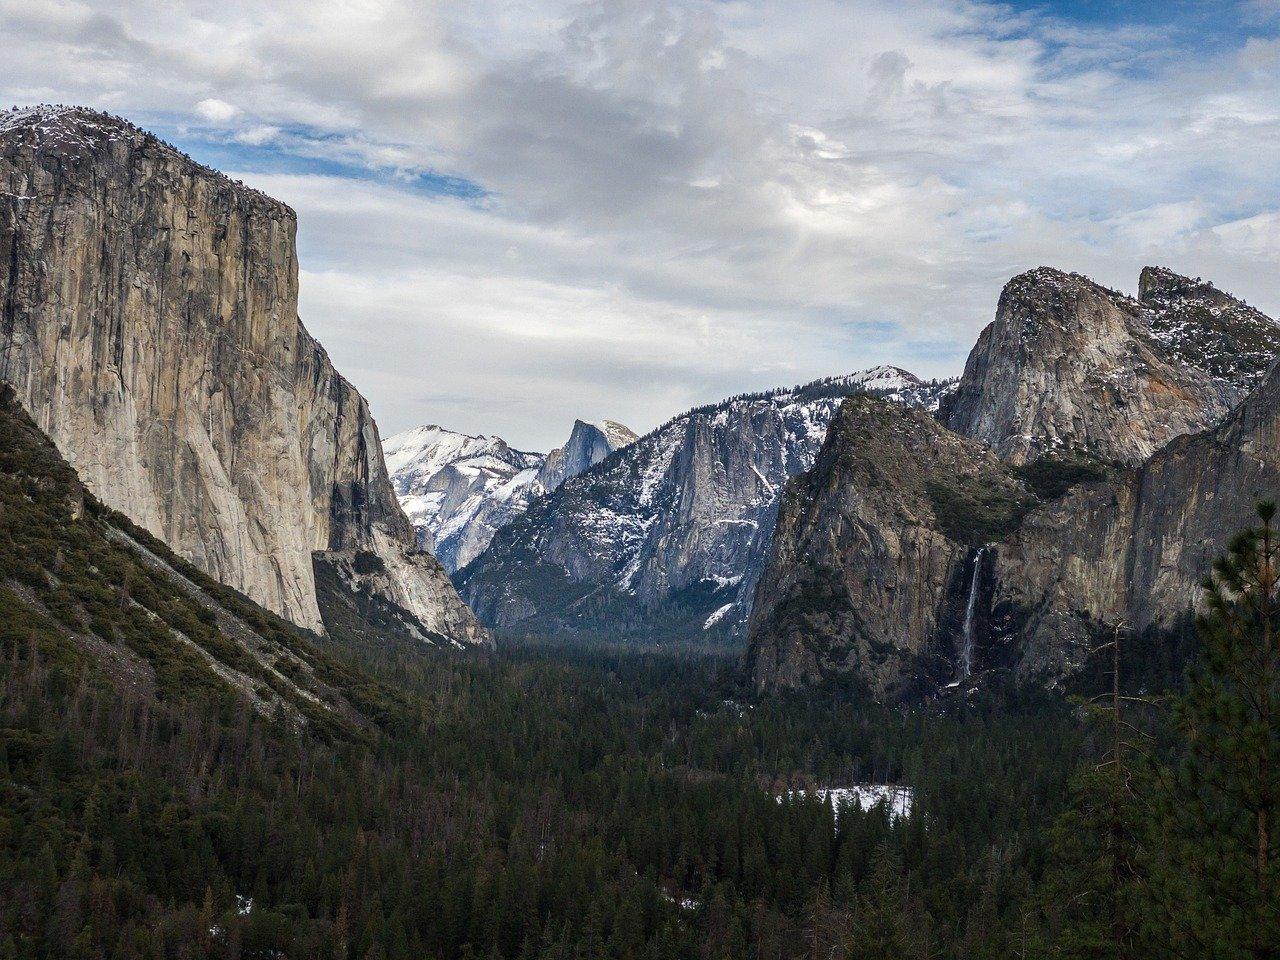 Yosemite Valley, California - Most Beautiful Valleys to Visit in California